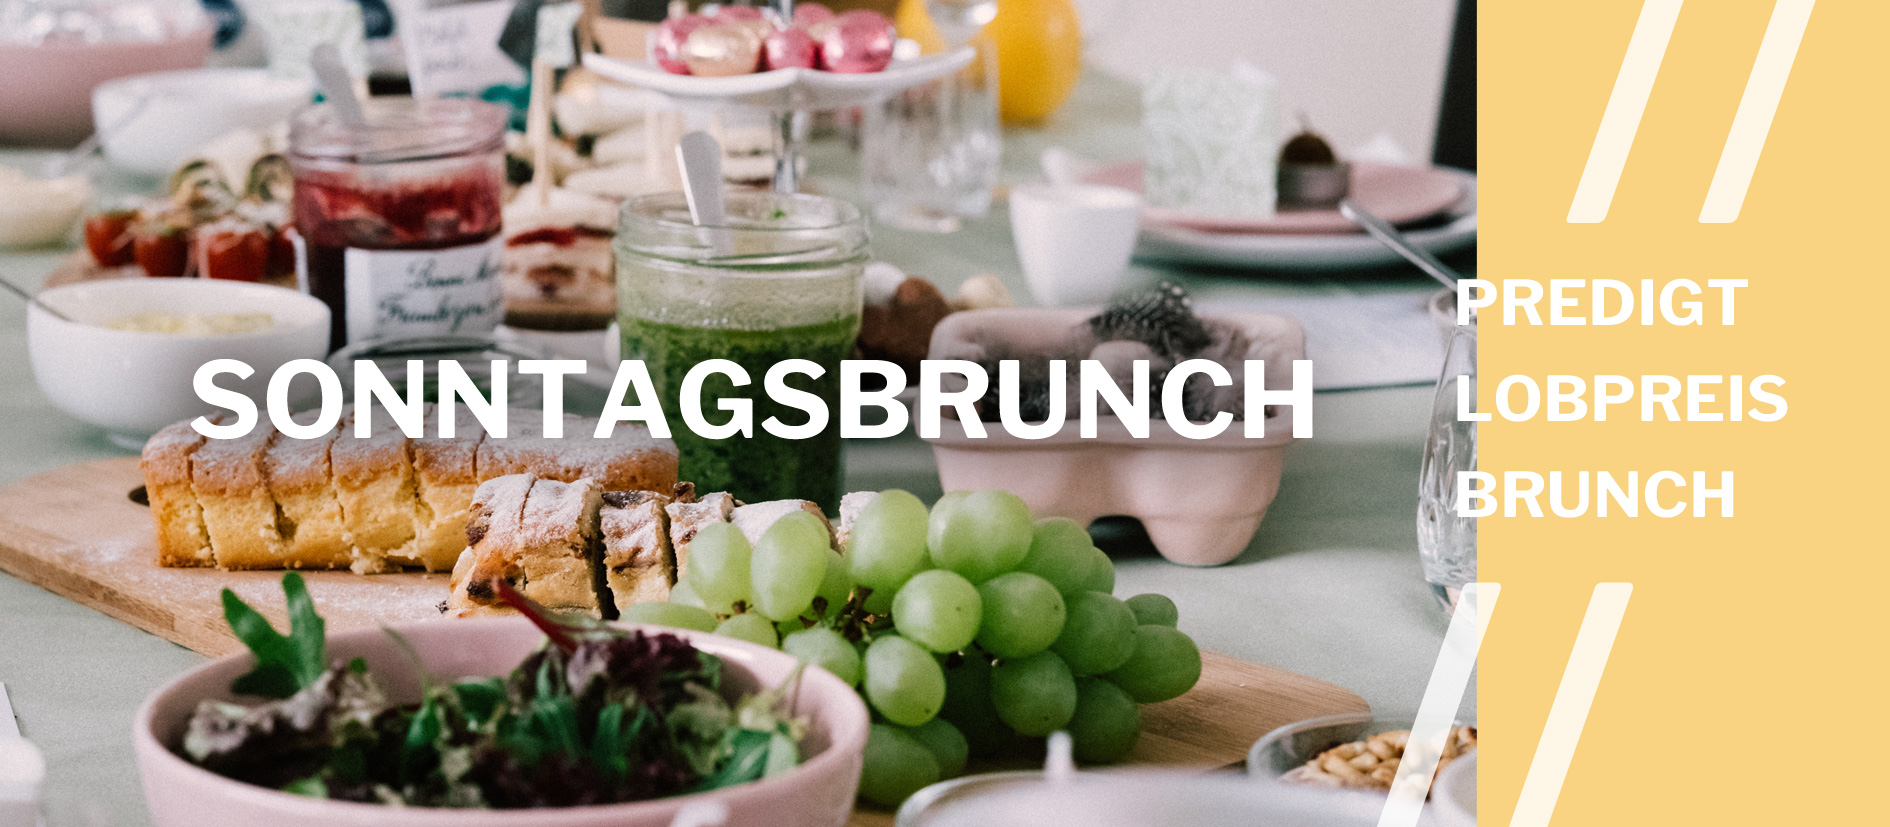 https://www.ev-freikirche-landau.de/wp-content/uploads/2019/02/Sonntagsbrunch.jpg